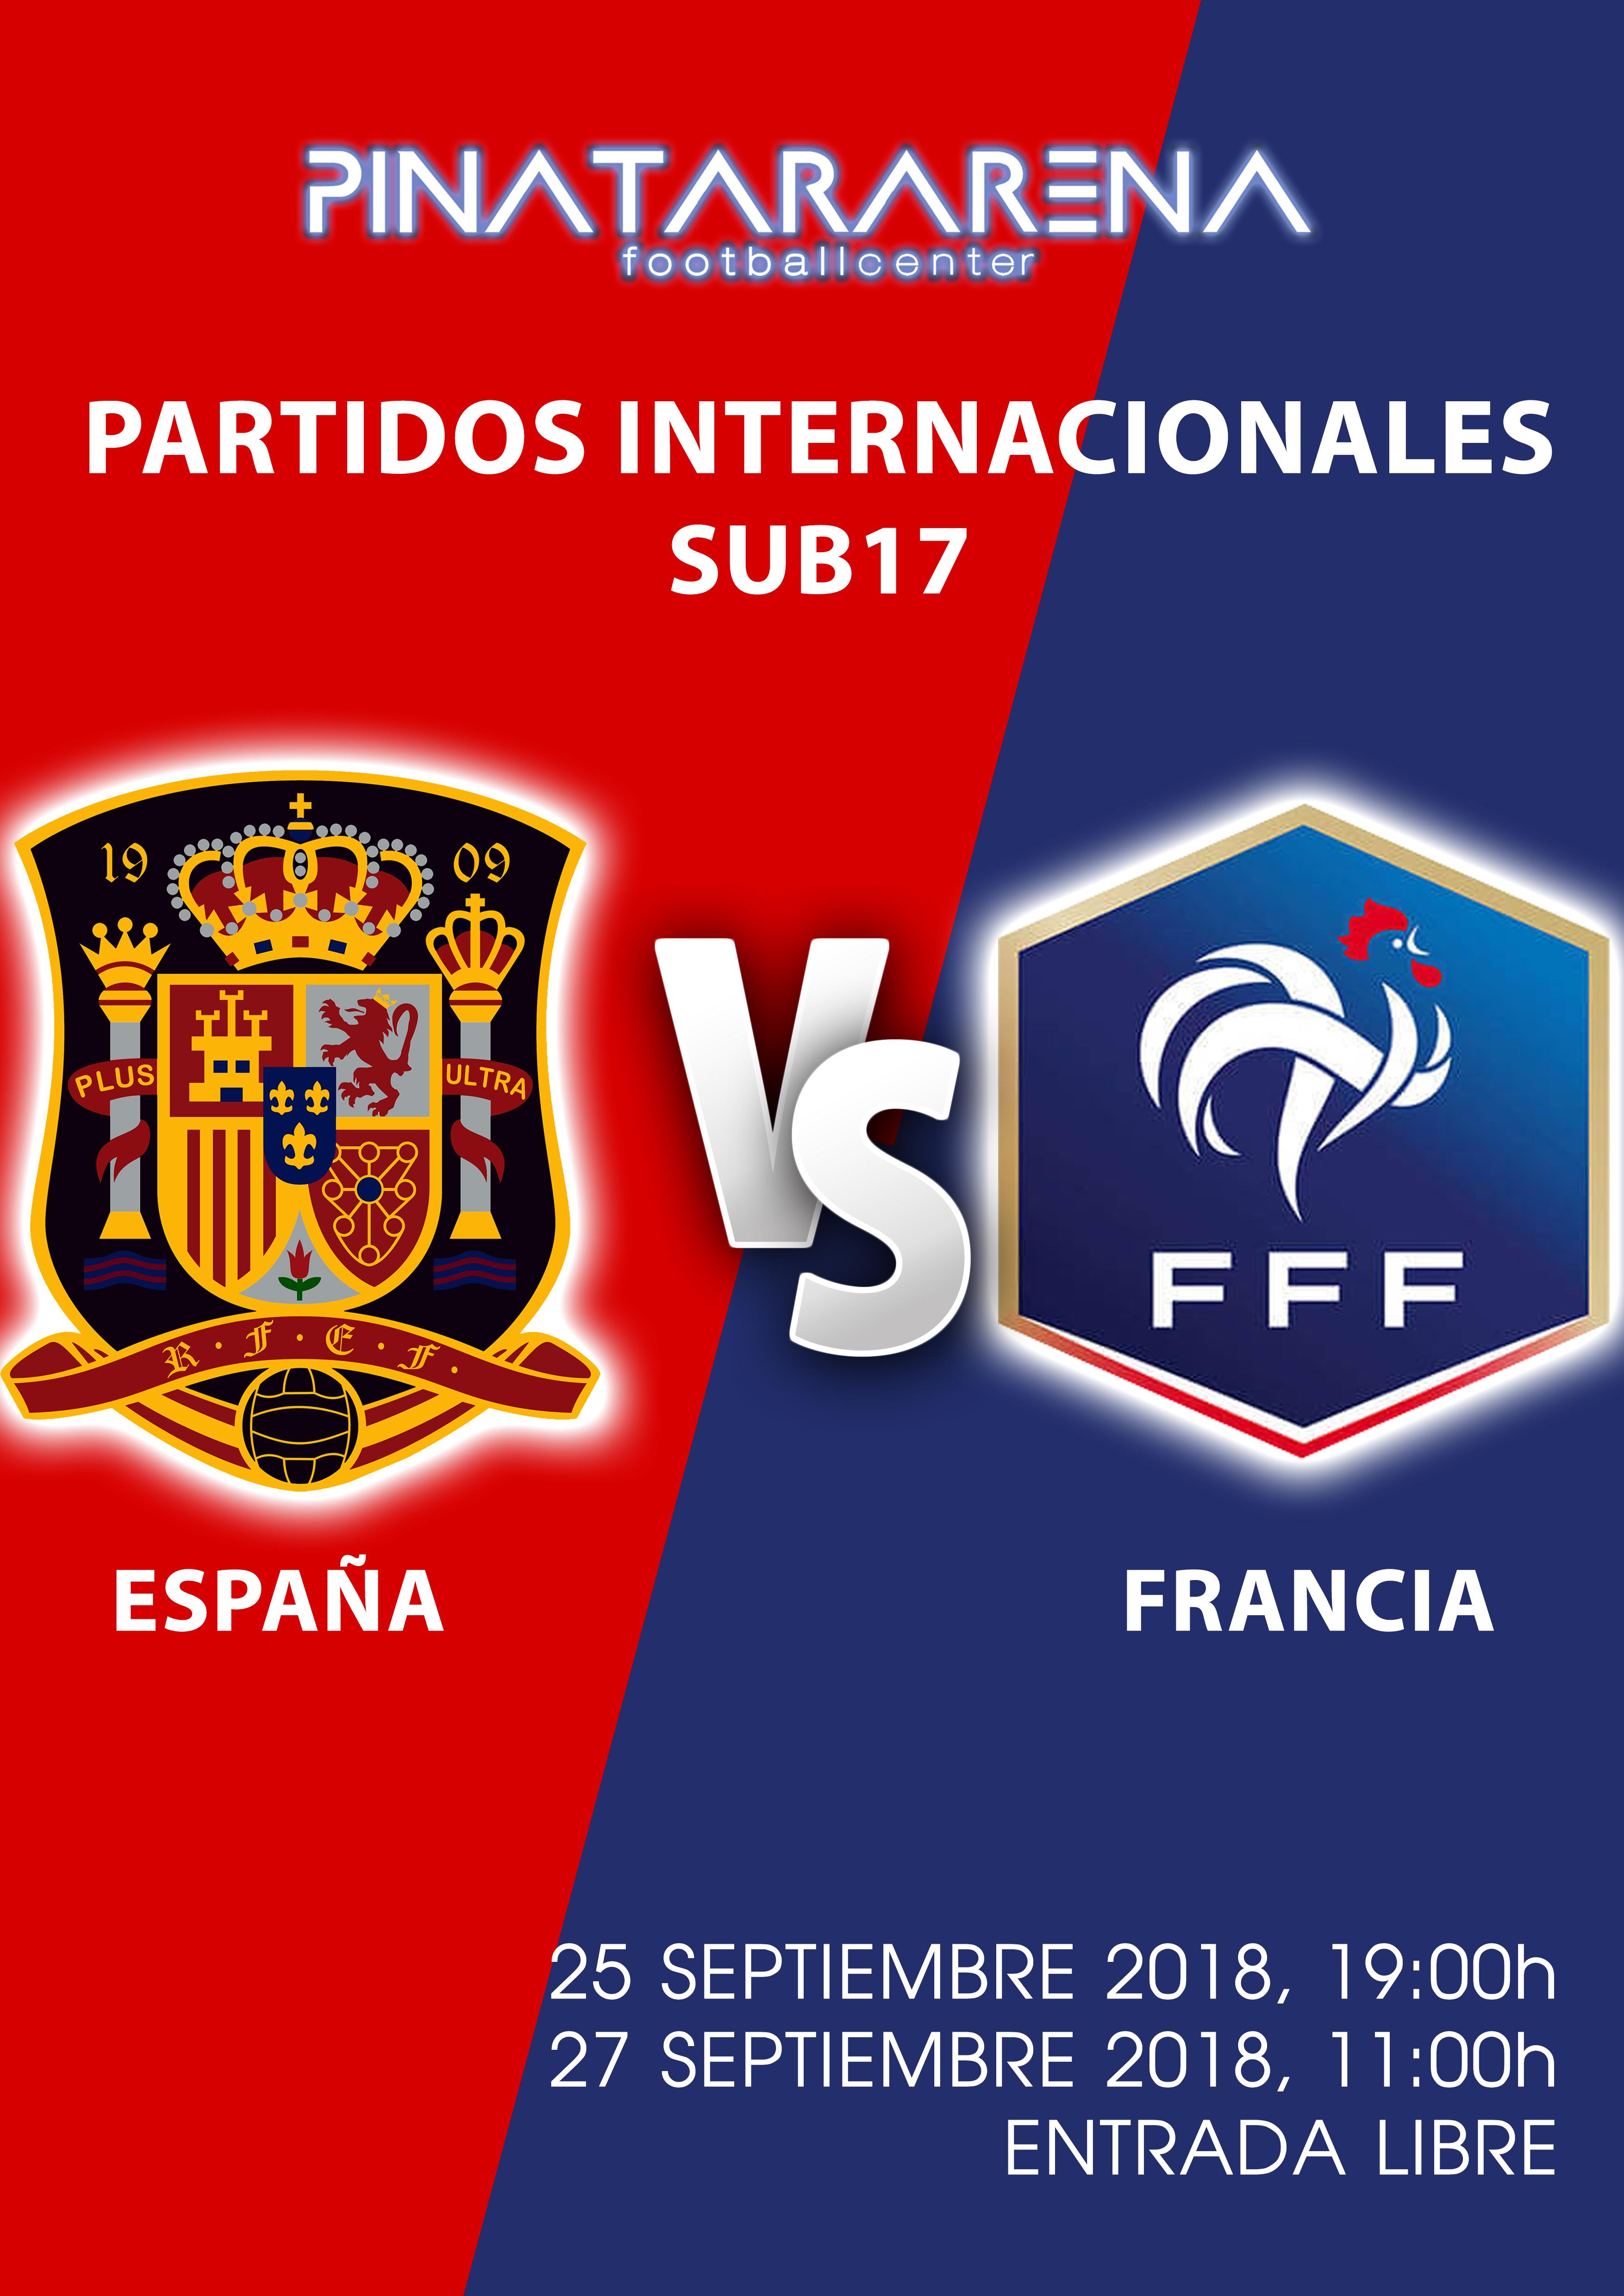 Spain v France Under 17 International at Pinatar Arena